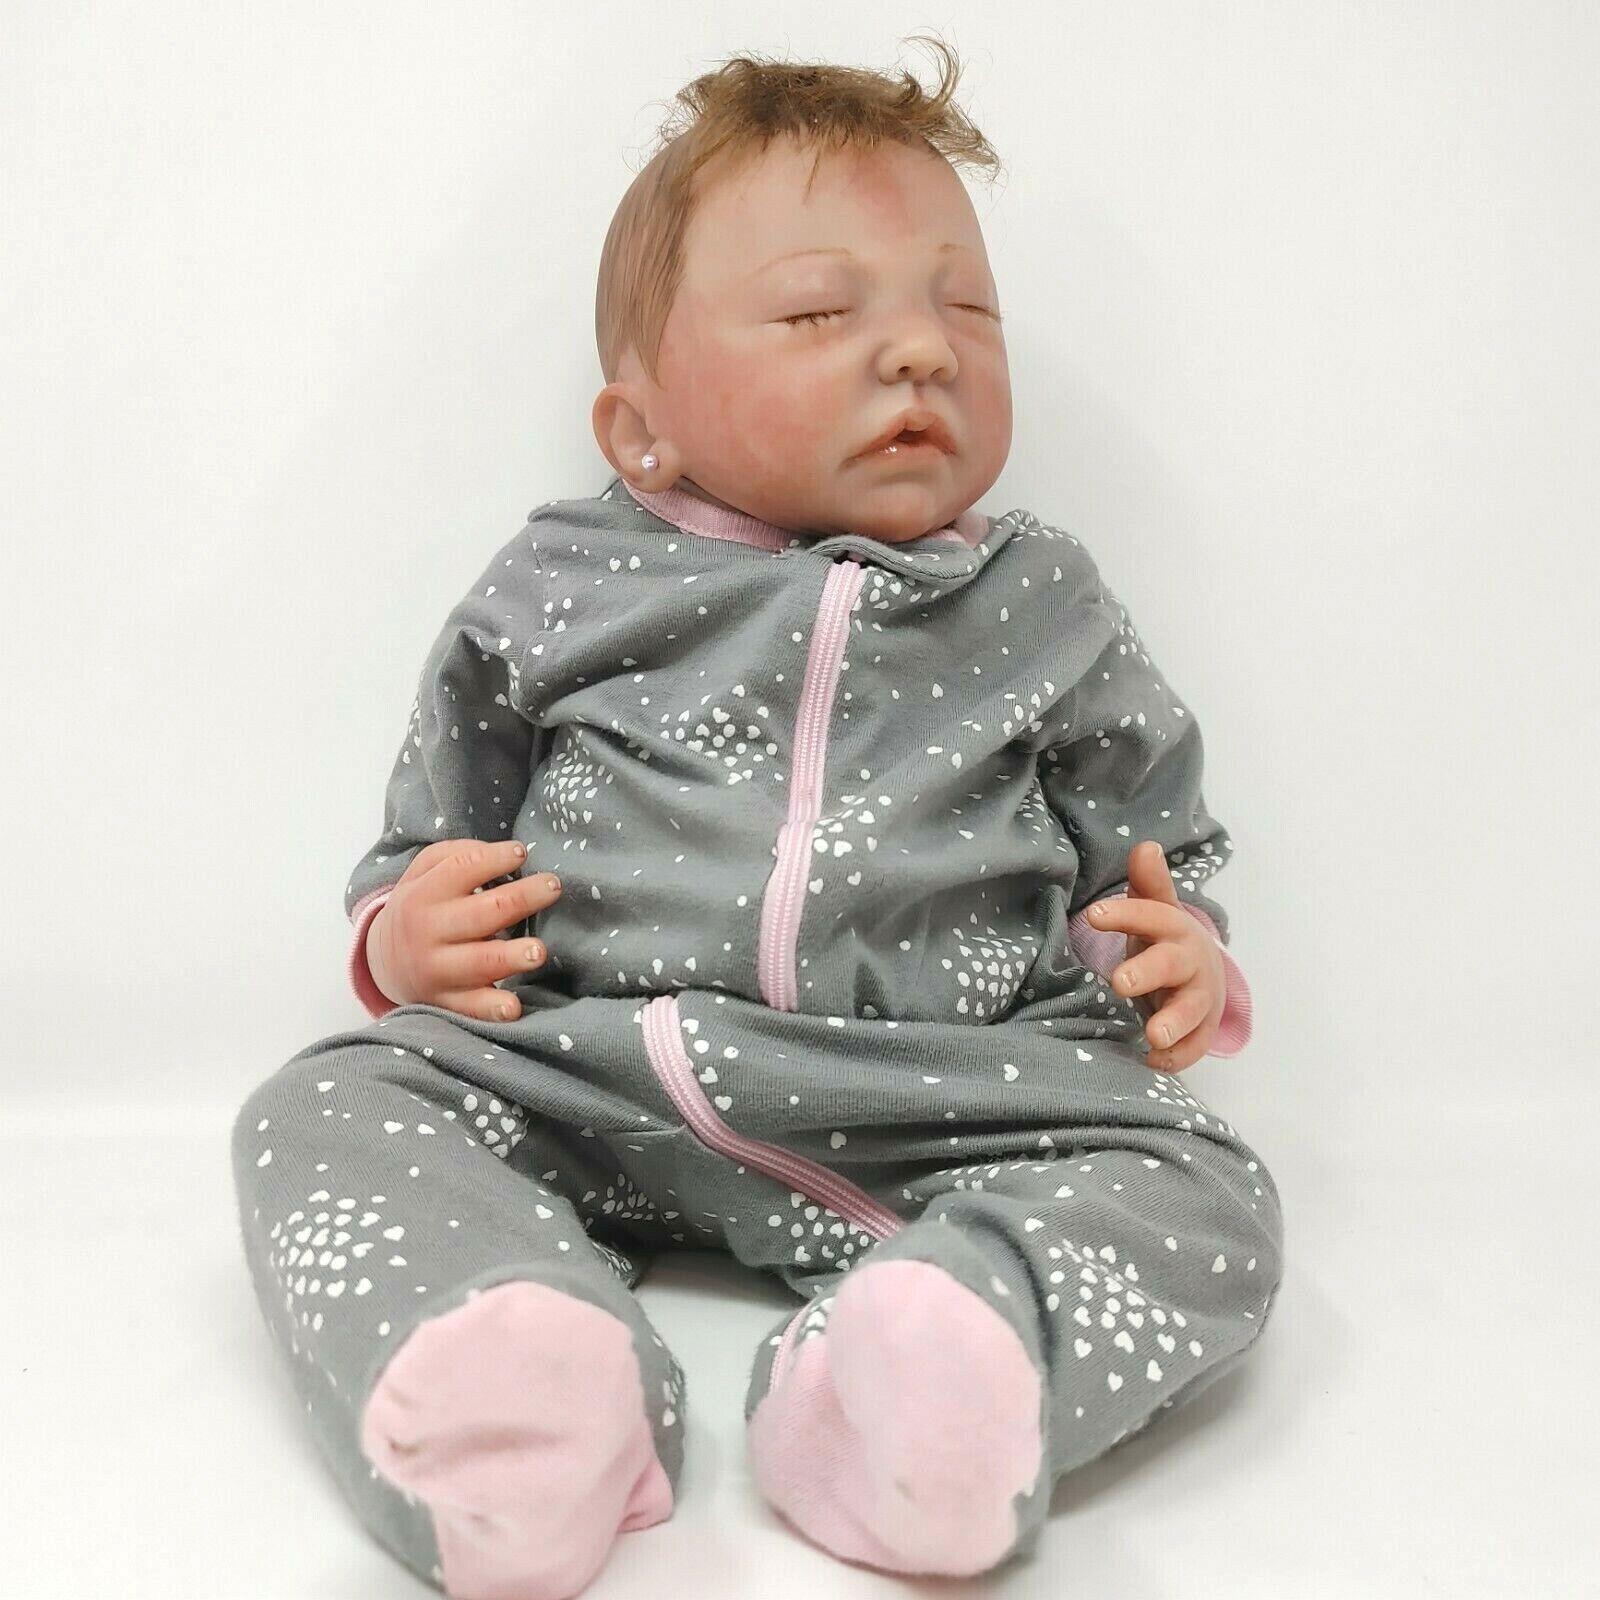 "Reborn Baby Doll - 20"" - 4lbs - Lifelike Infant - Cloth Body"